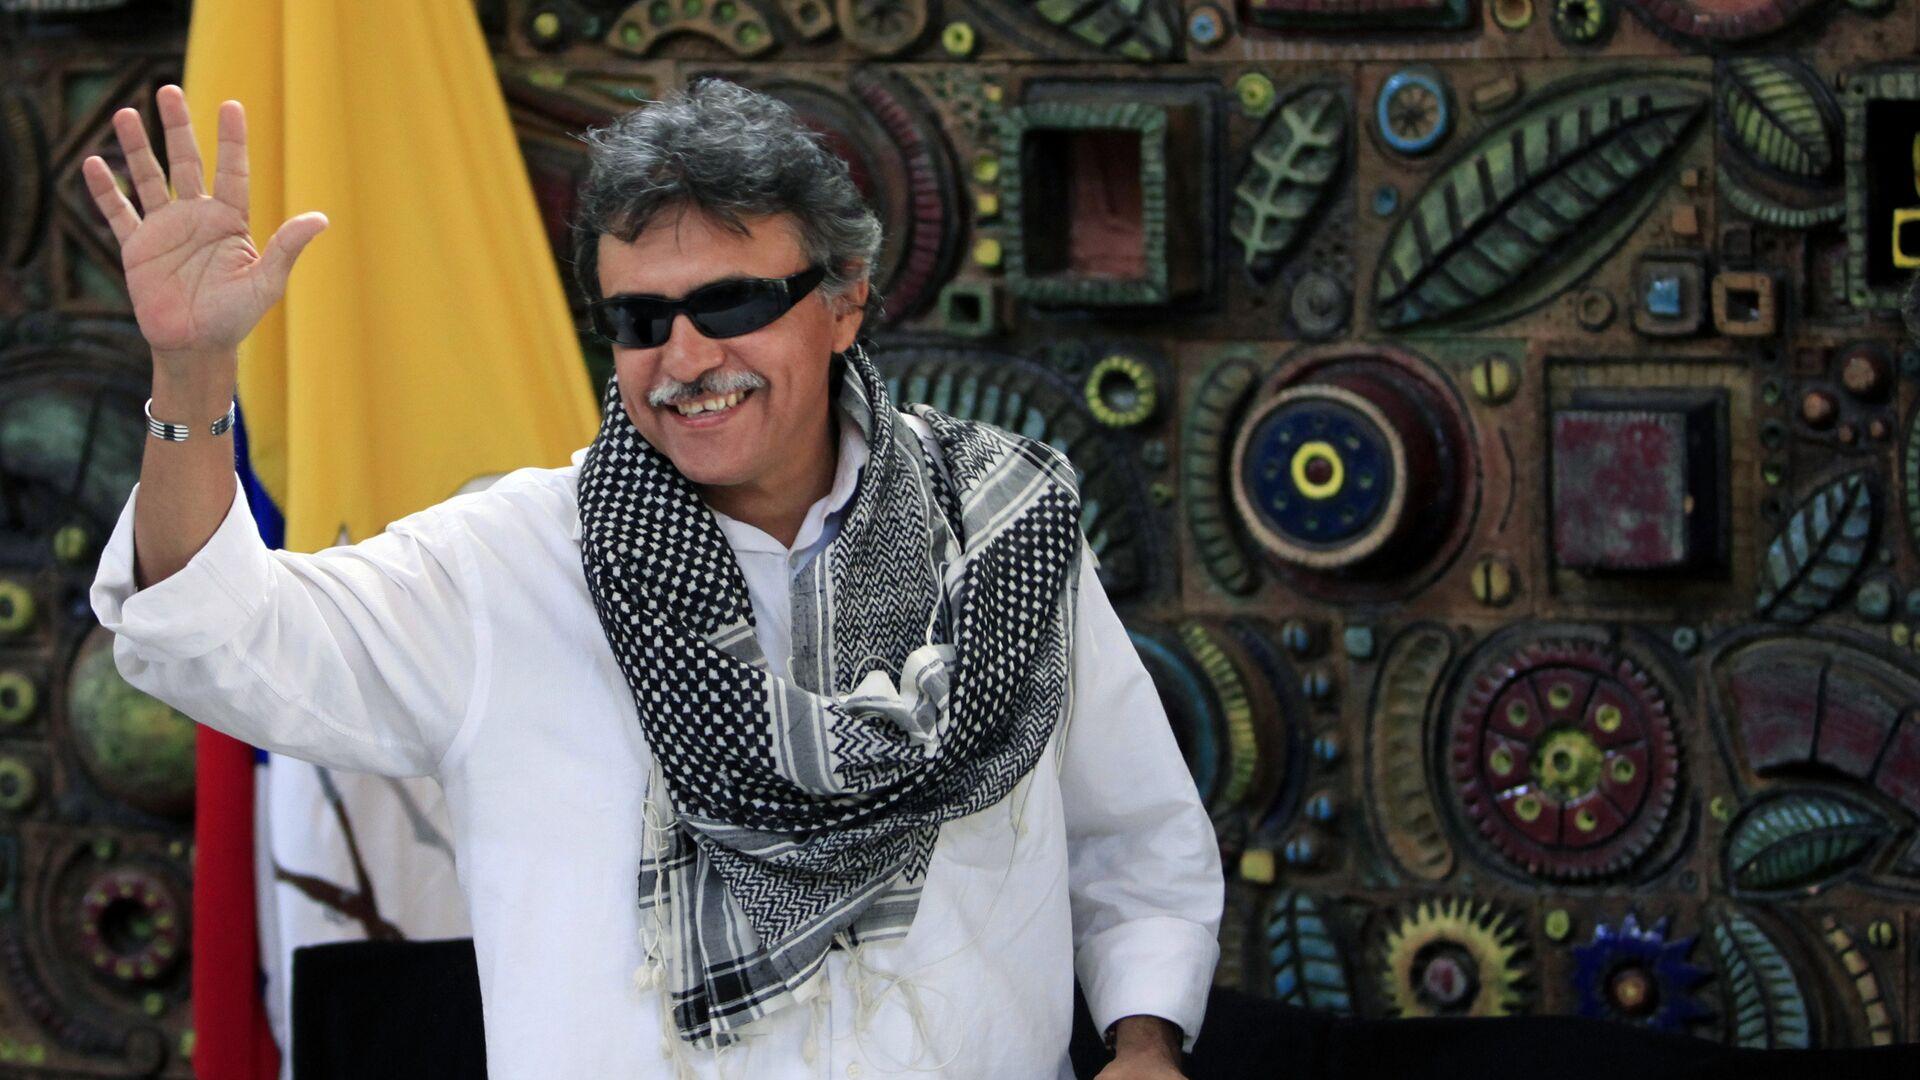 Jesús Santrich, exguerrillero colombiano, integrante del partido político FARC - Sputnik Mundo, 1920, 18.05.2021